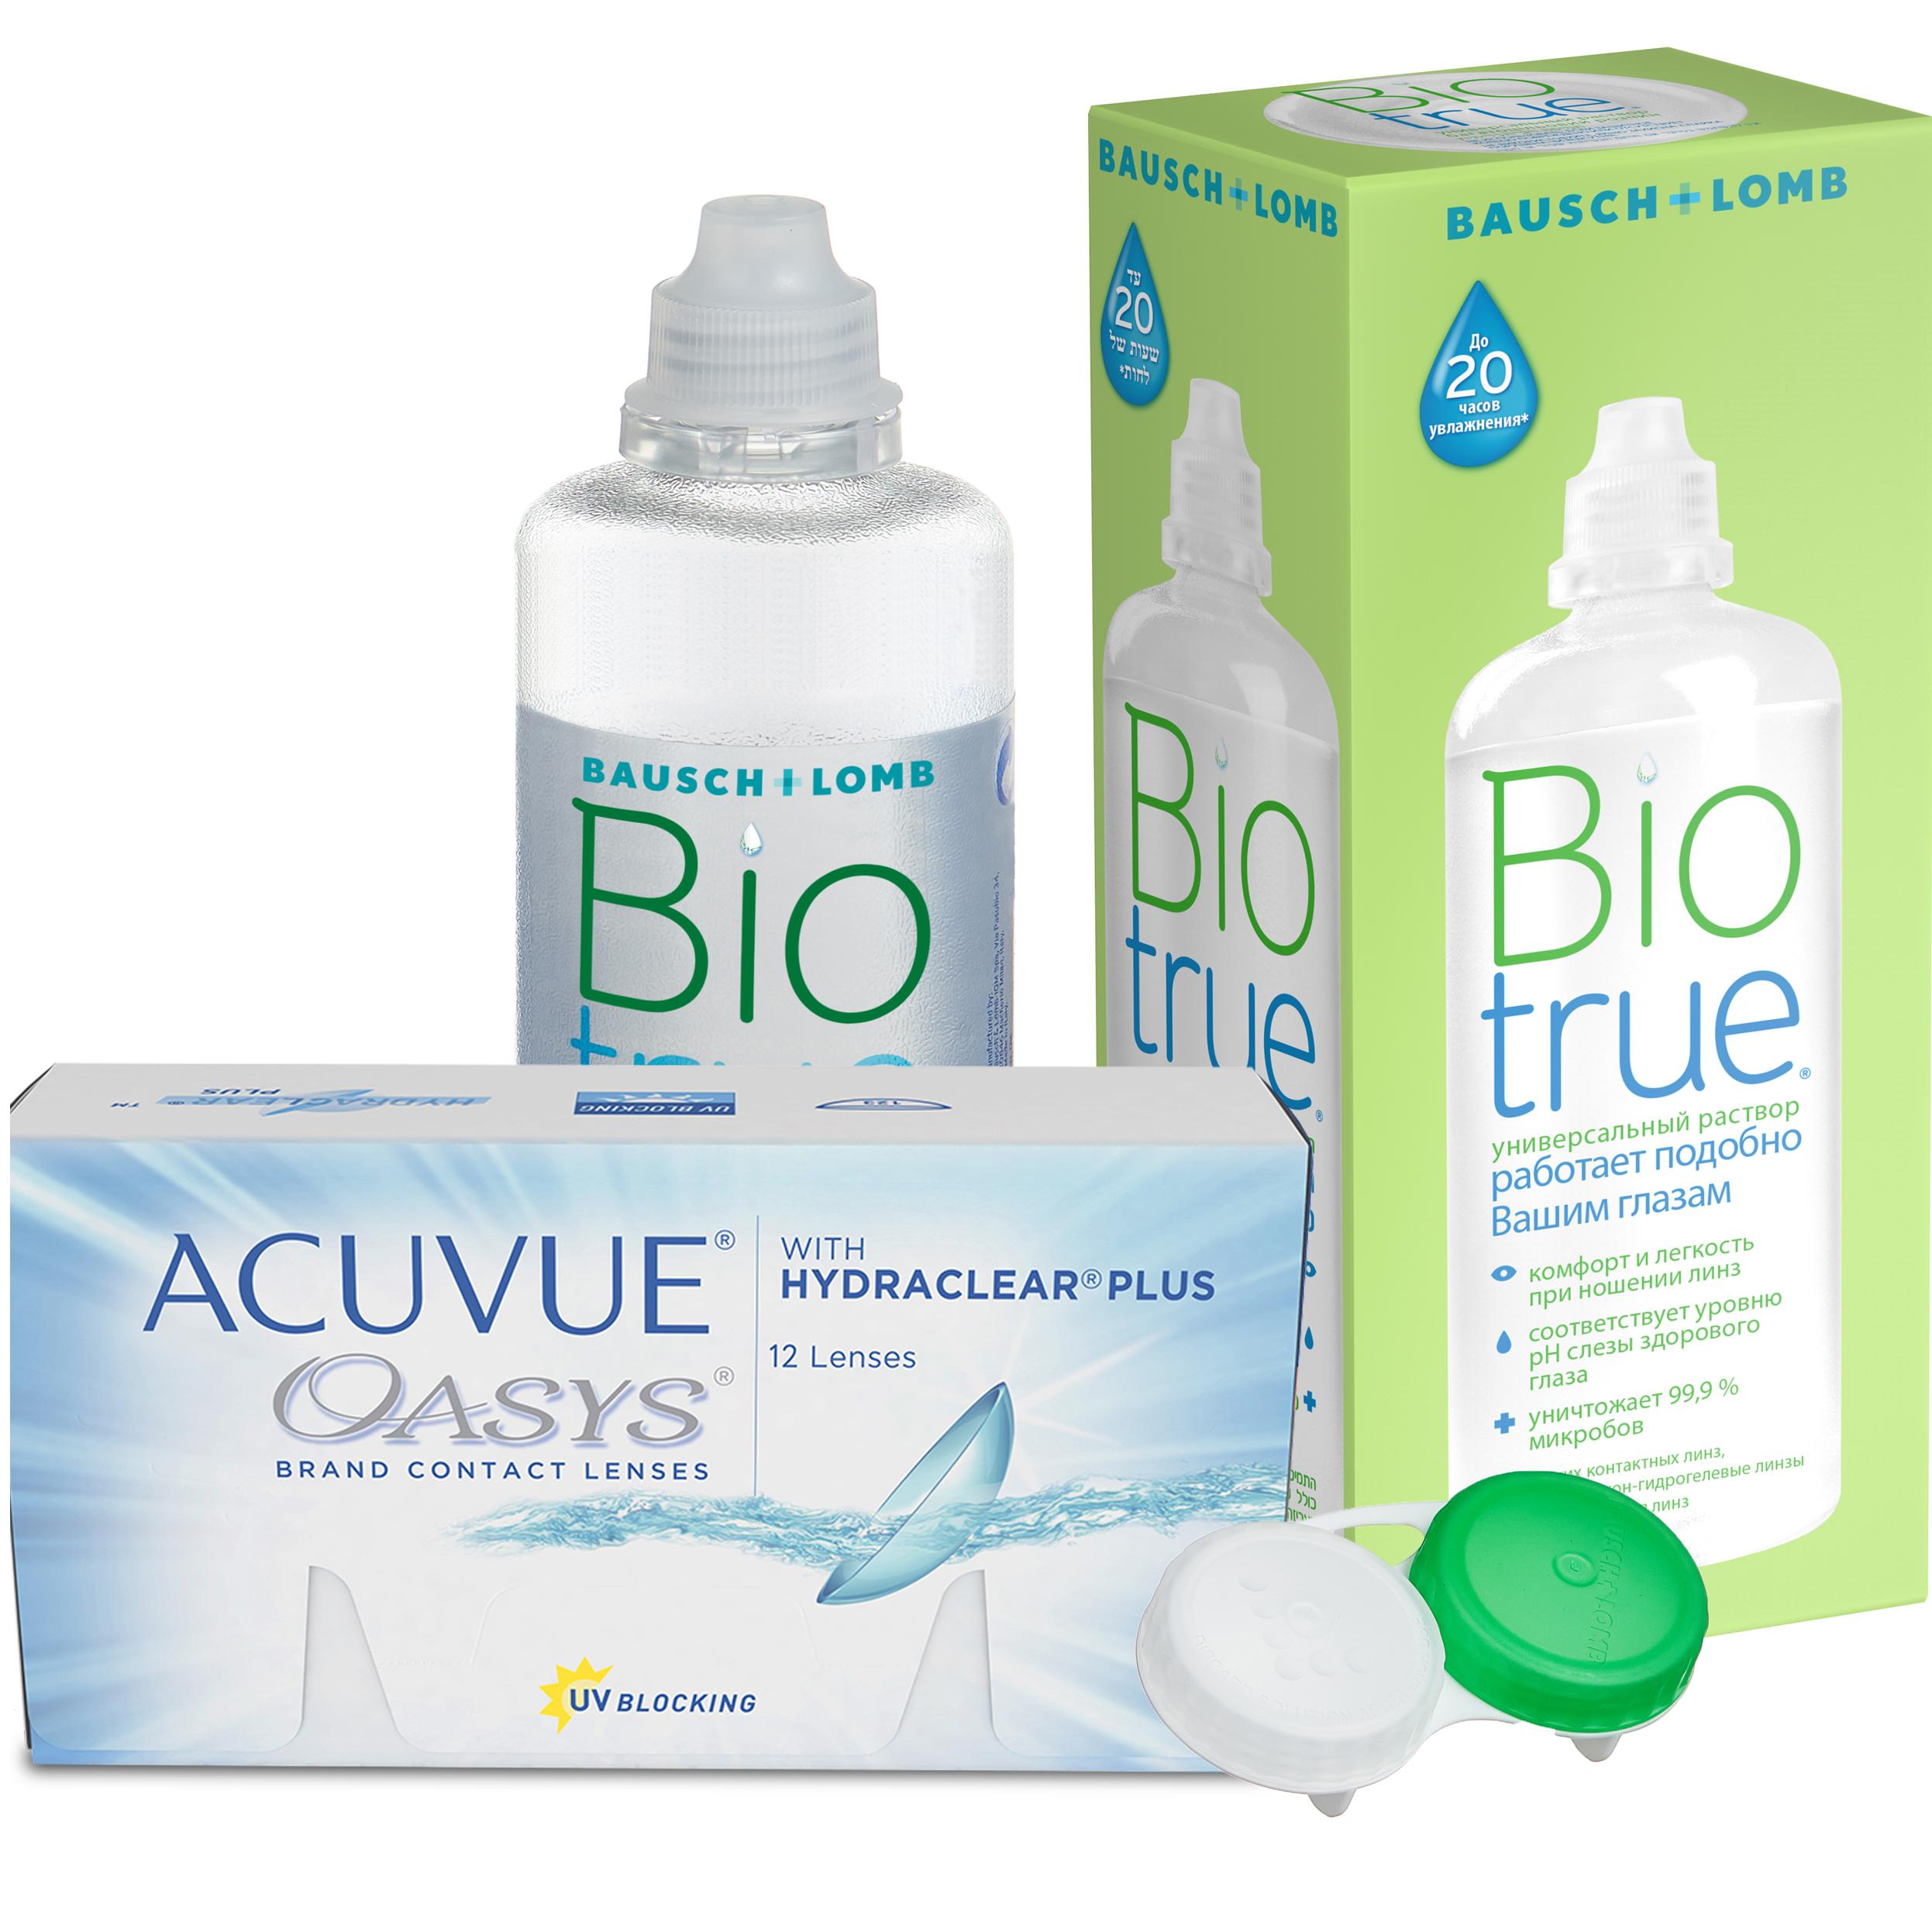 Купить Oasys with Hydraclear Plus 12 линз + Biotrue, Контактные линзы Acuvue Oasys with Hydraclear Plus 12 линз R 8.4 +3, 00 + Biotrue 300 мл